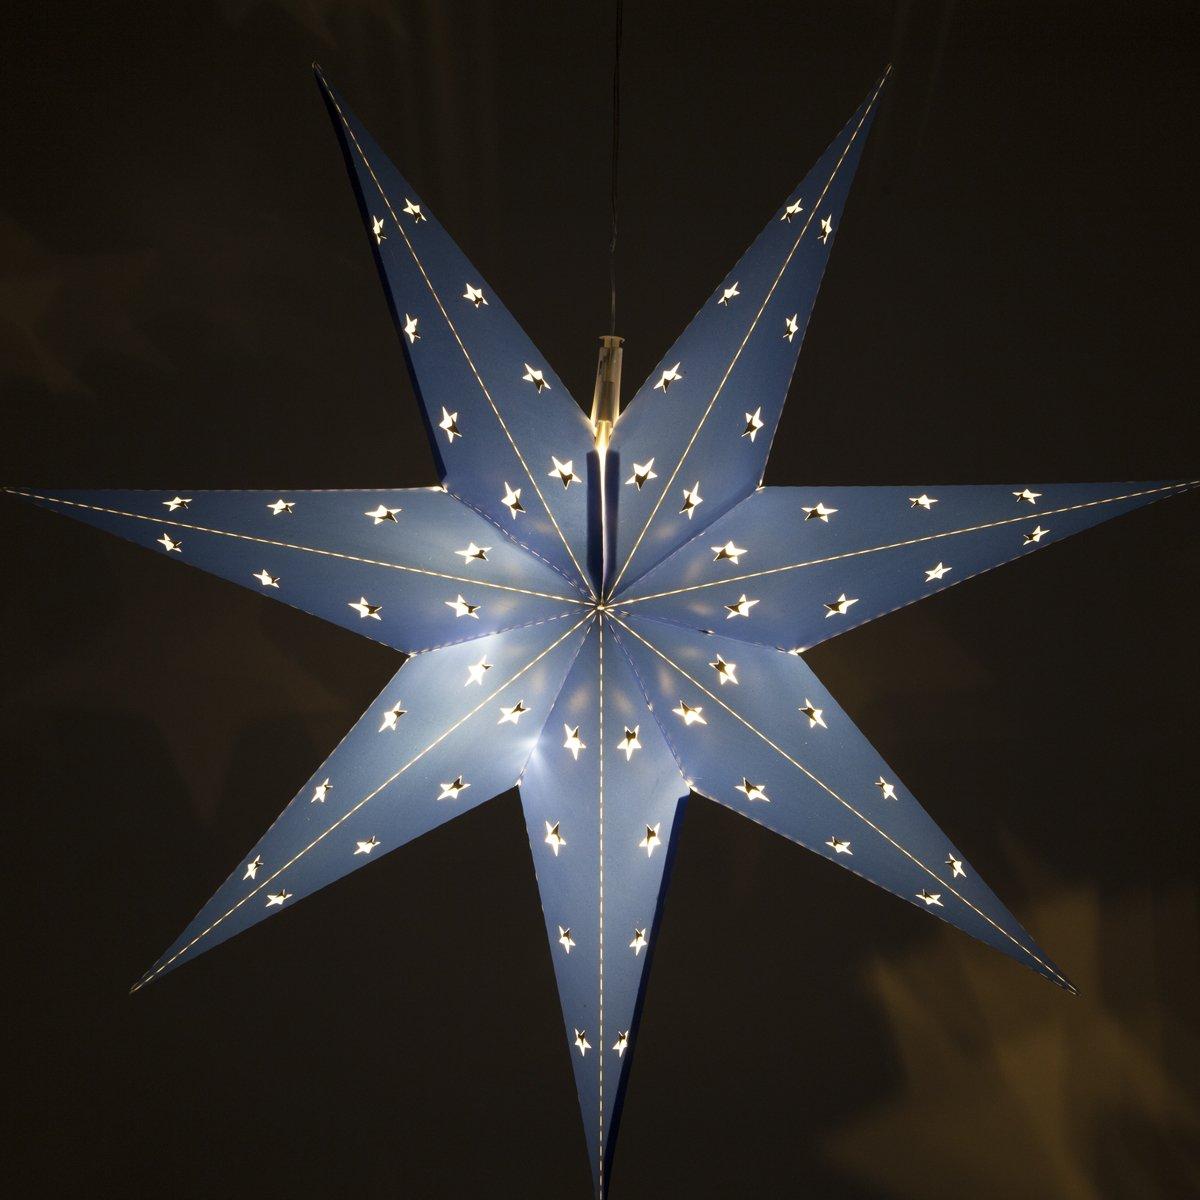 Wintergreen Lighting Fold-Flat 7-Point Star Light – Hanging Star – Christmas Star Light Decoration/Battery-Powered with Timer (24'', Blue)